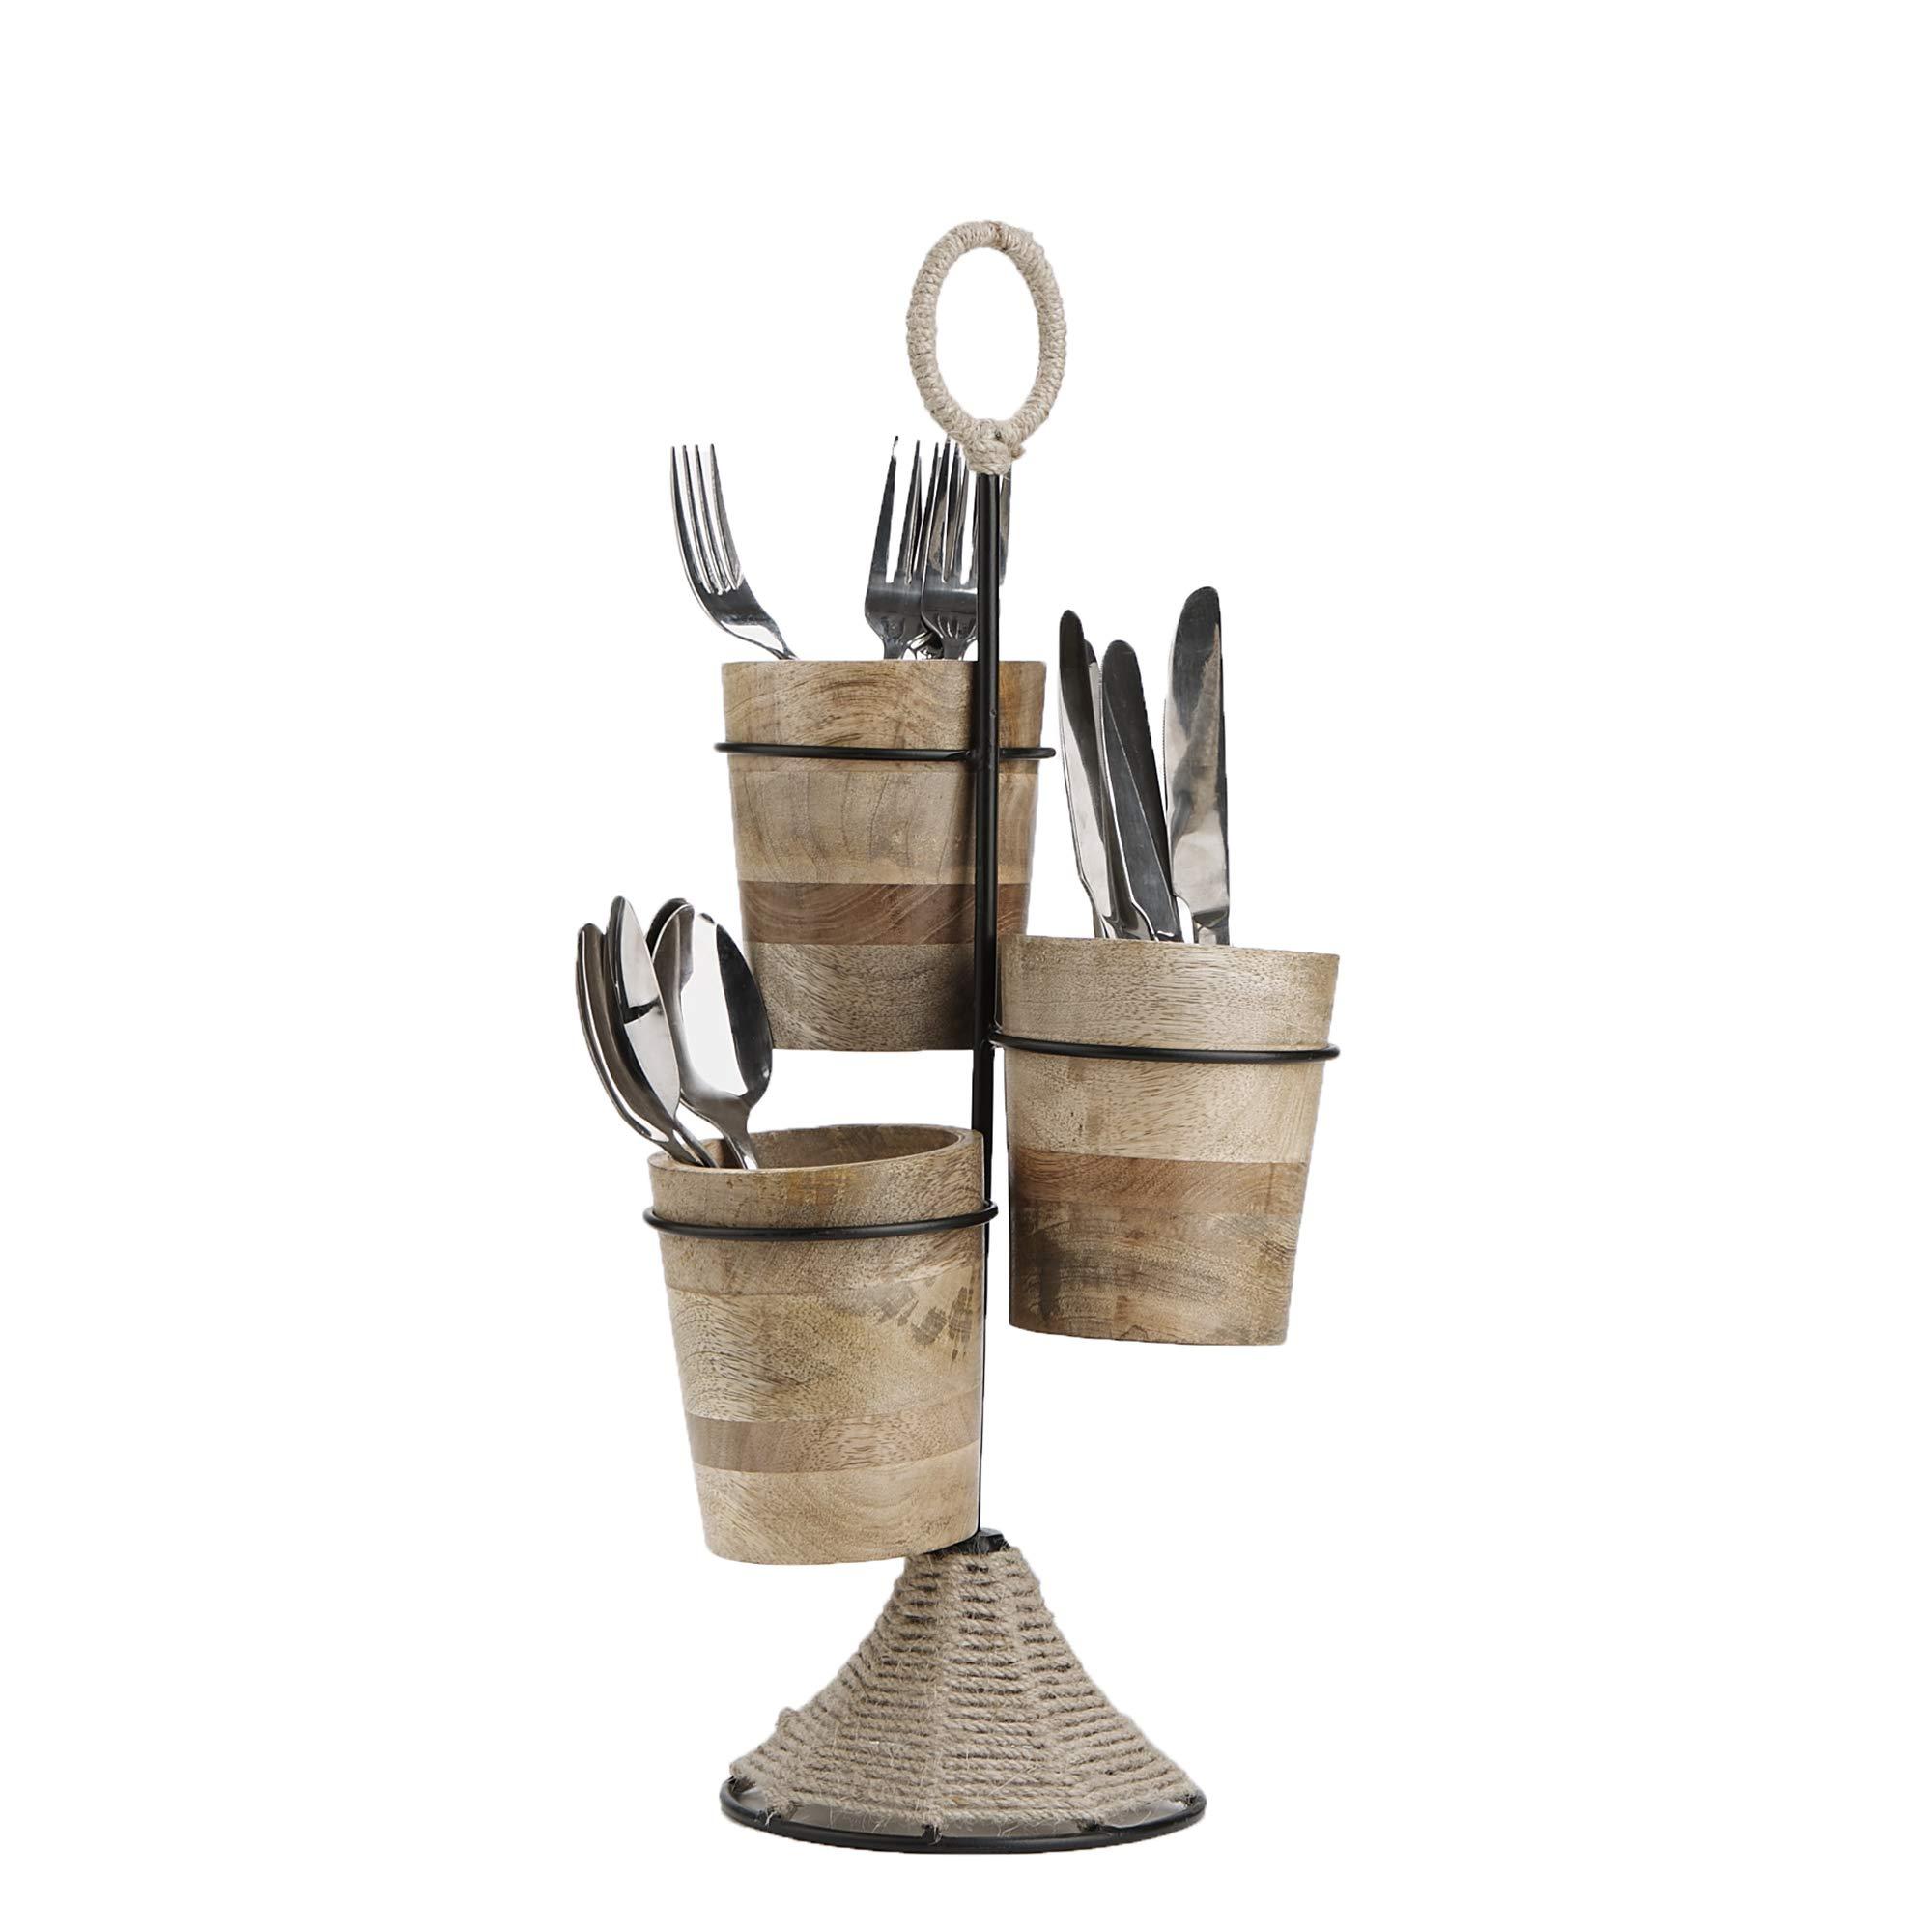 Mind Reader UTENROPE3-BRN Utensil Caddy, Flatware Organizer, Serve ware Holder, Silverware, Cookware, Forks, Spoons, Knives - Brown, One Size,